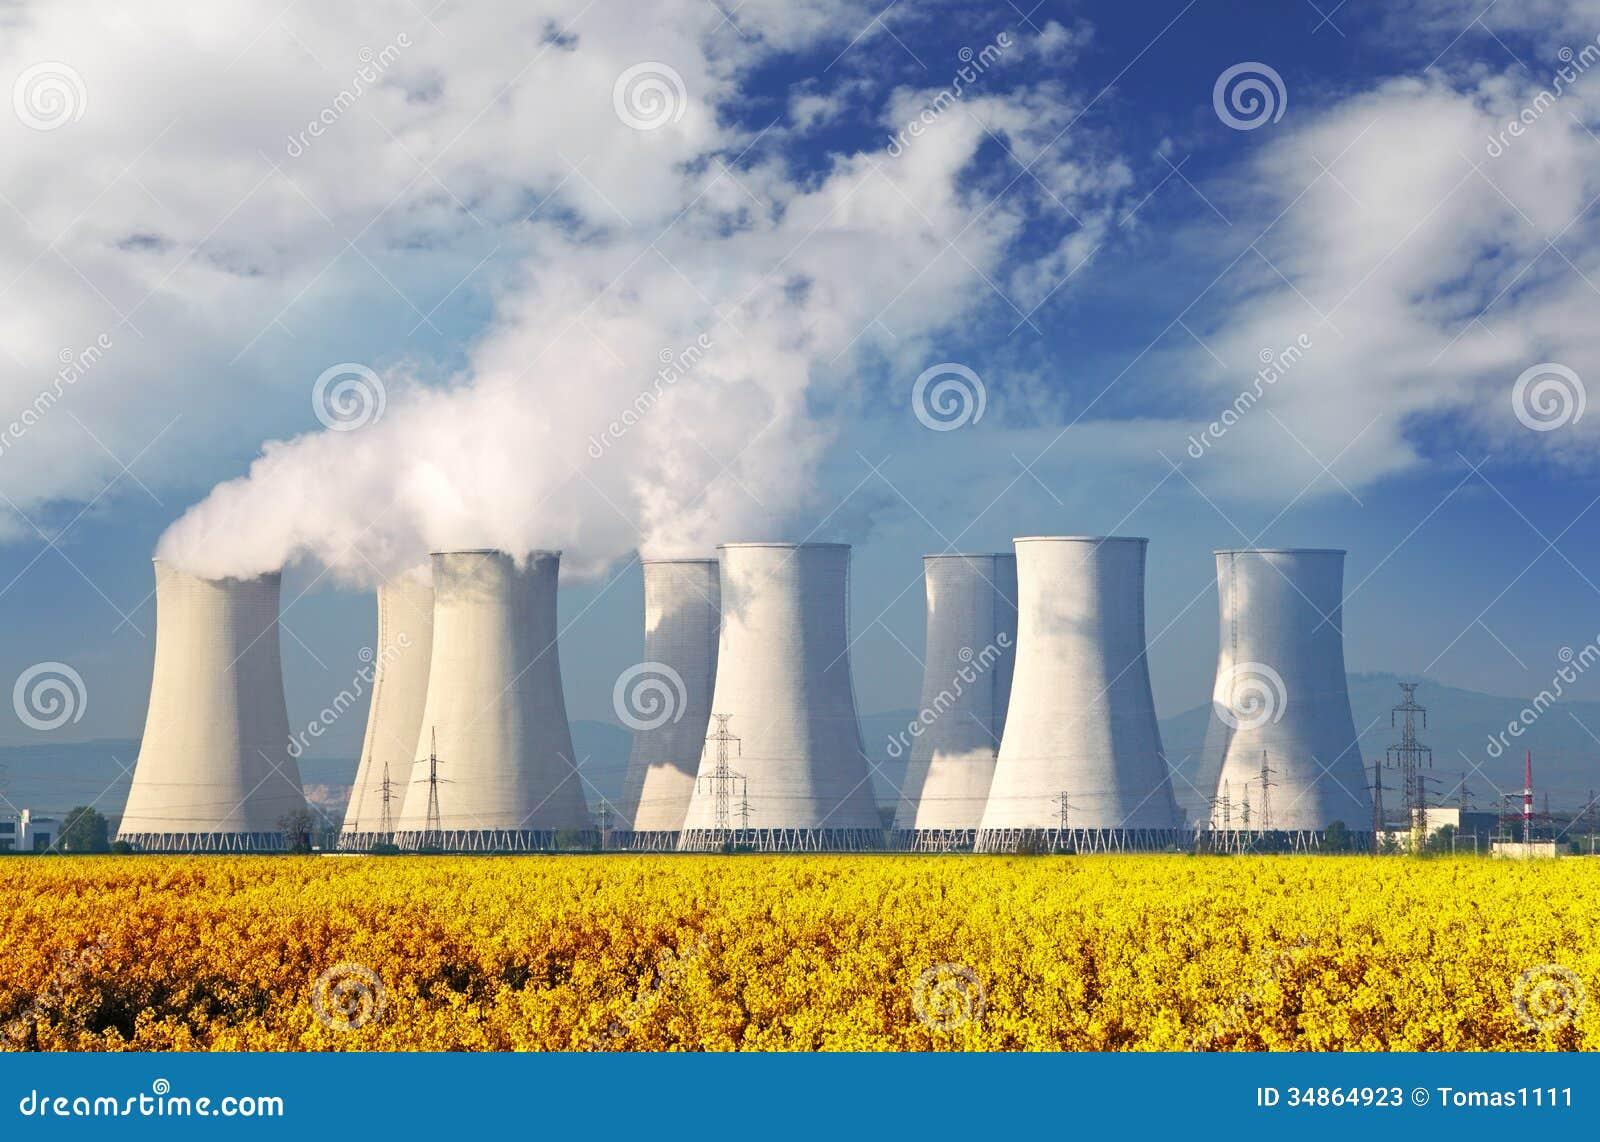 essay on nuclear power plant essay on nuclear power plant argumentative essay nuclear power plants in turkey